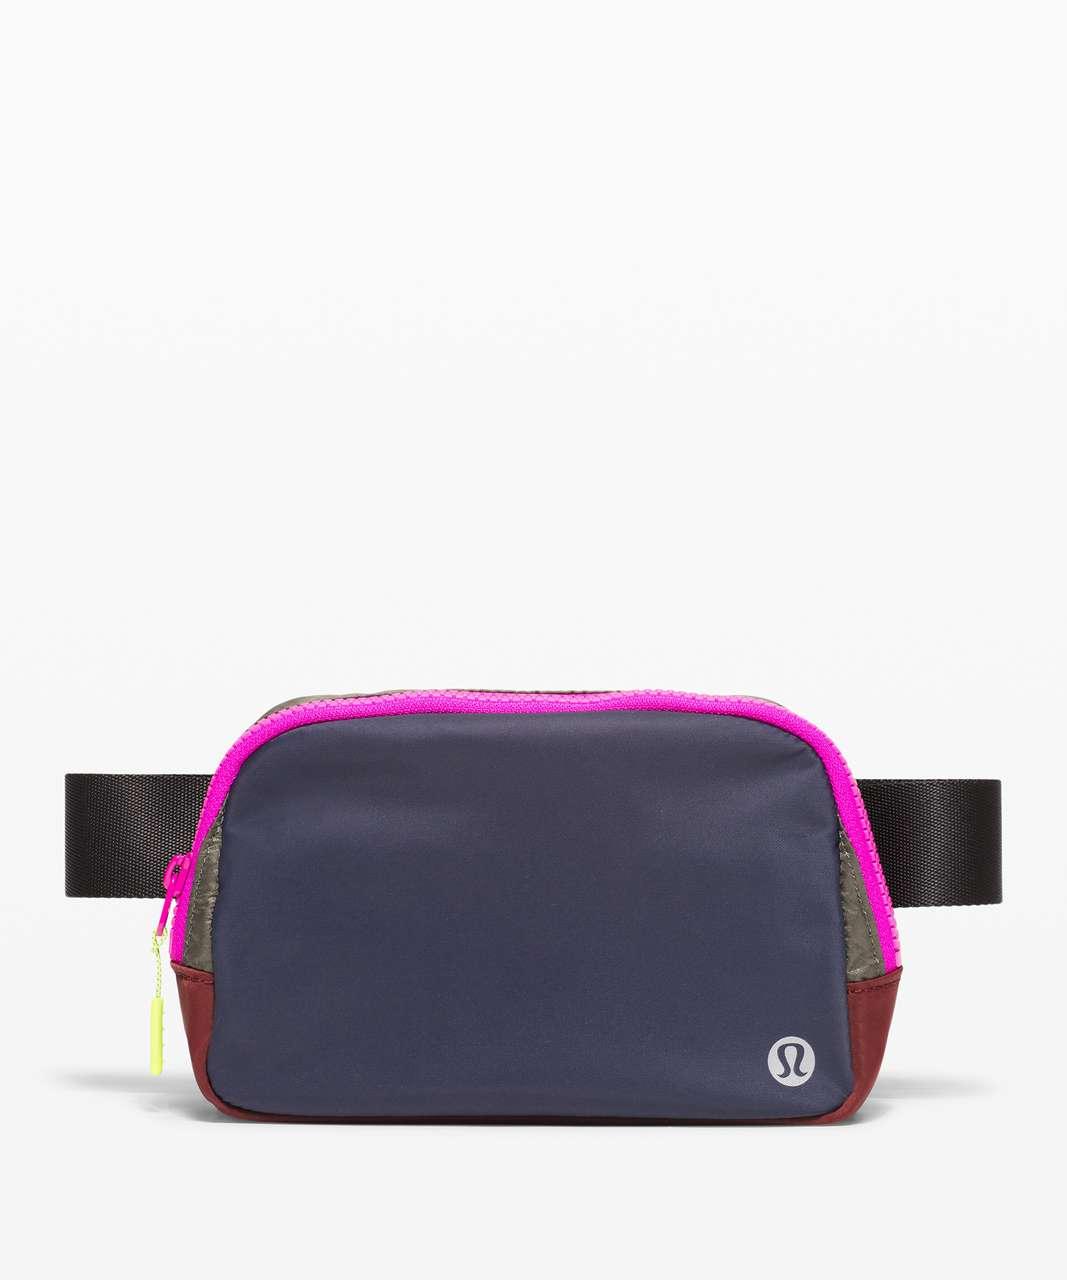 Lululemon Everywhere Belt Bag *1L - Cadet Blue / Army Green / Savannah